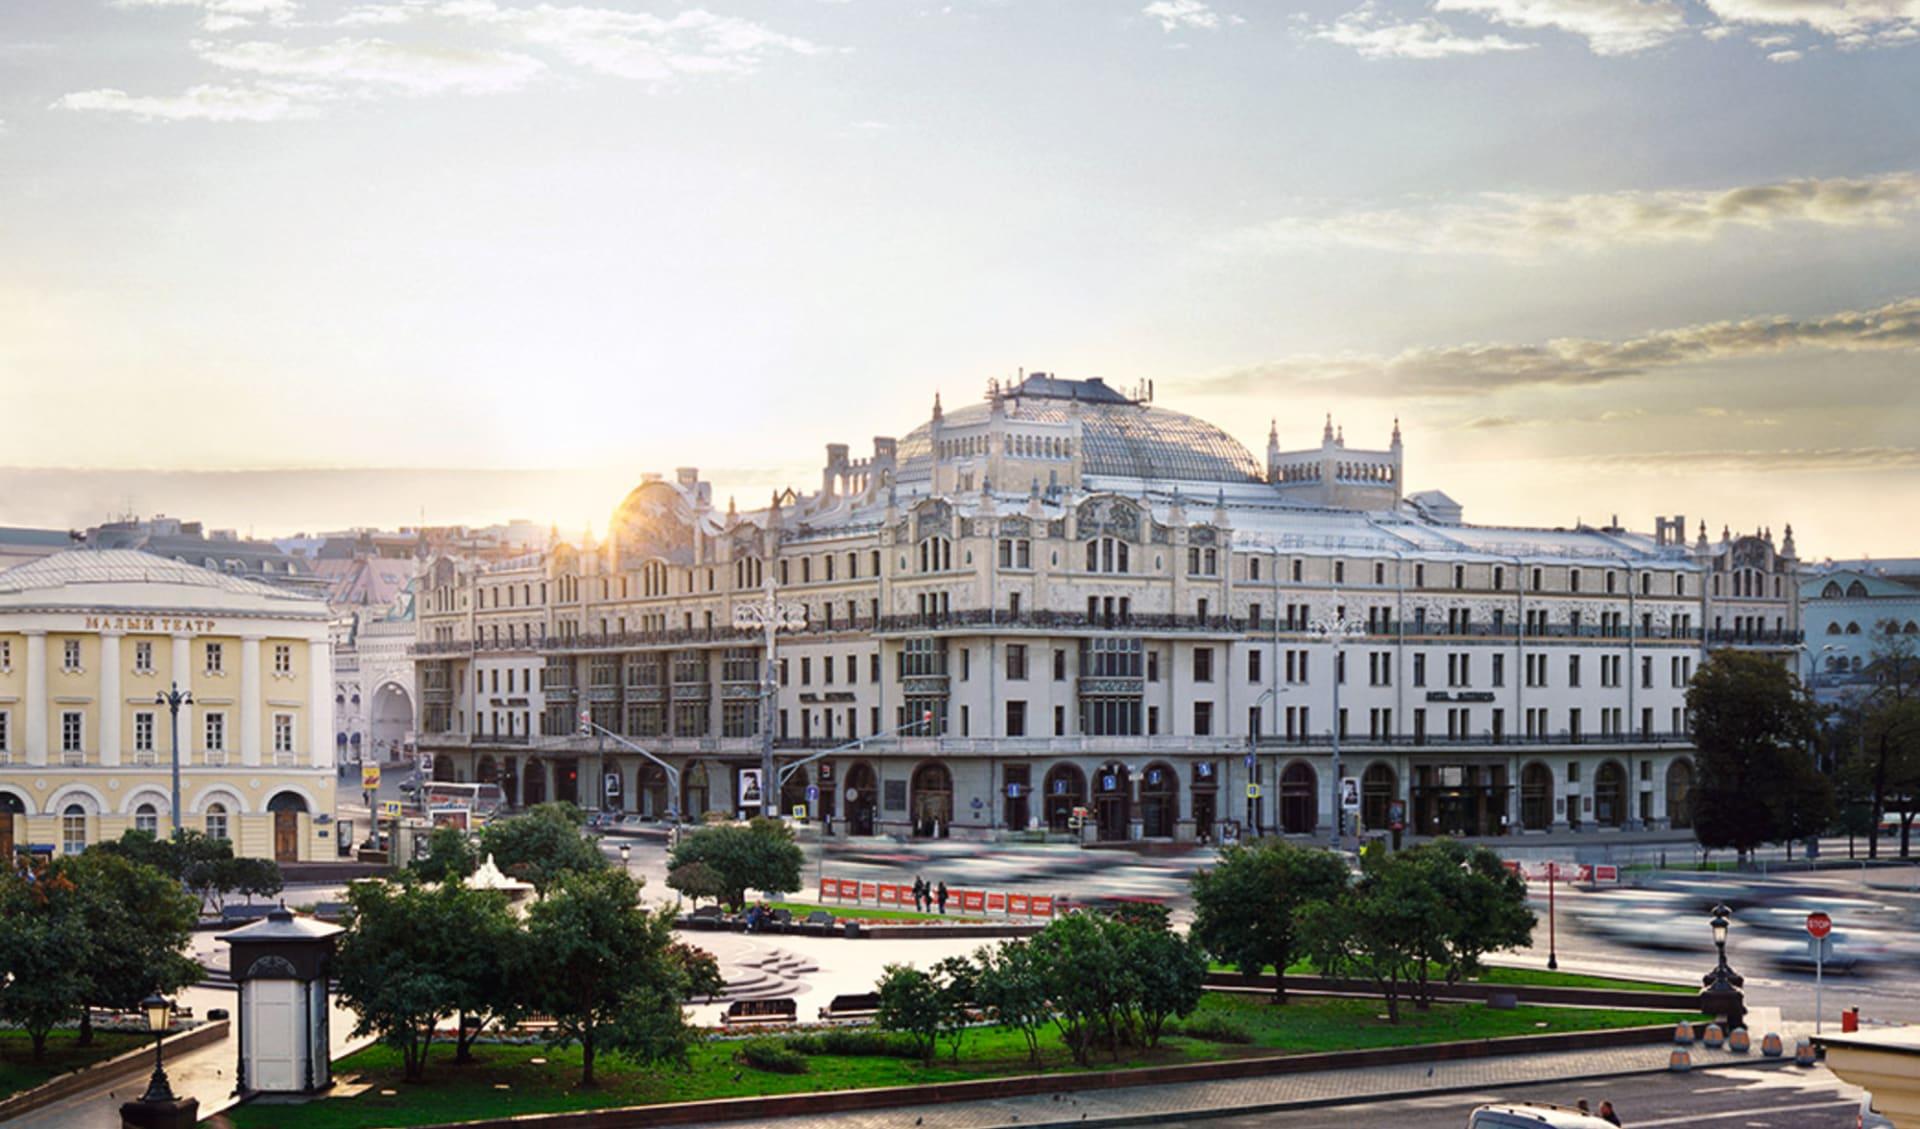 Hotel Metropol in Moskau: Russland_Moskau_Metropol_Morgenstimmung